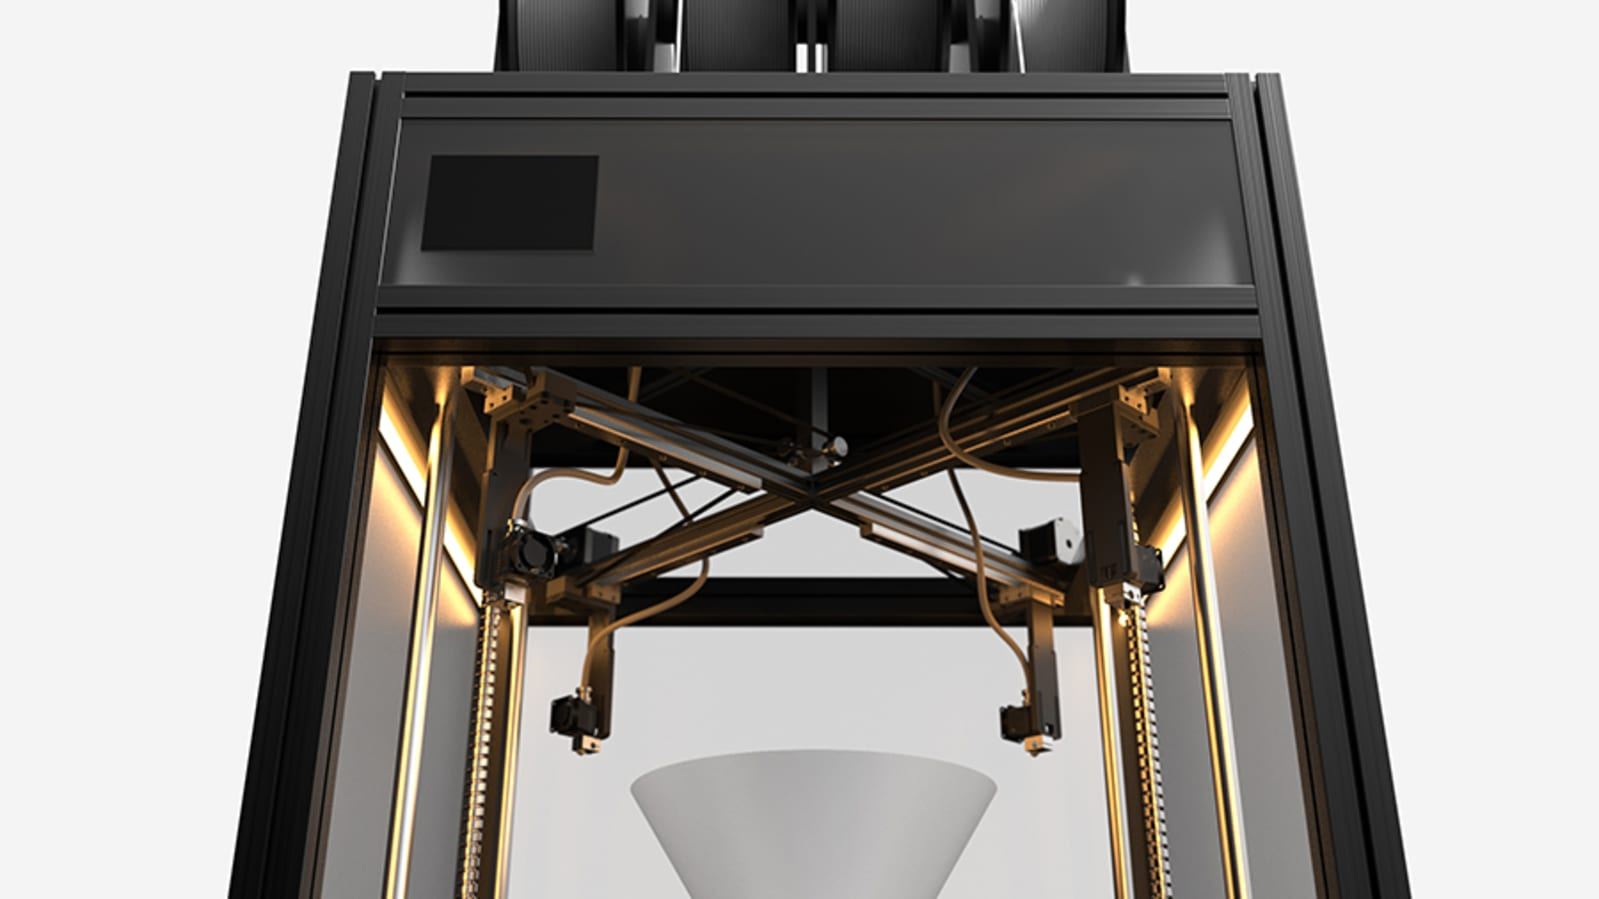 Dancer 3d printer with four printheads on four gantries